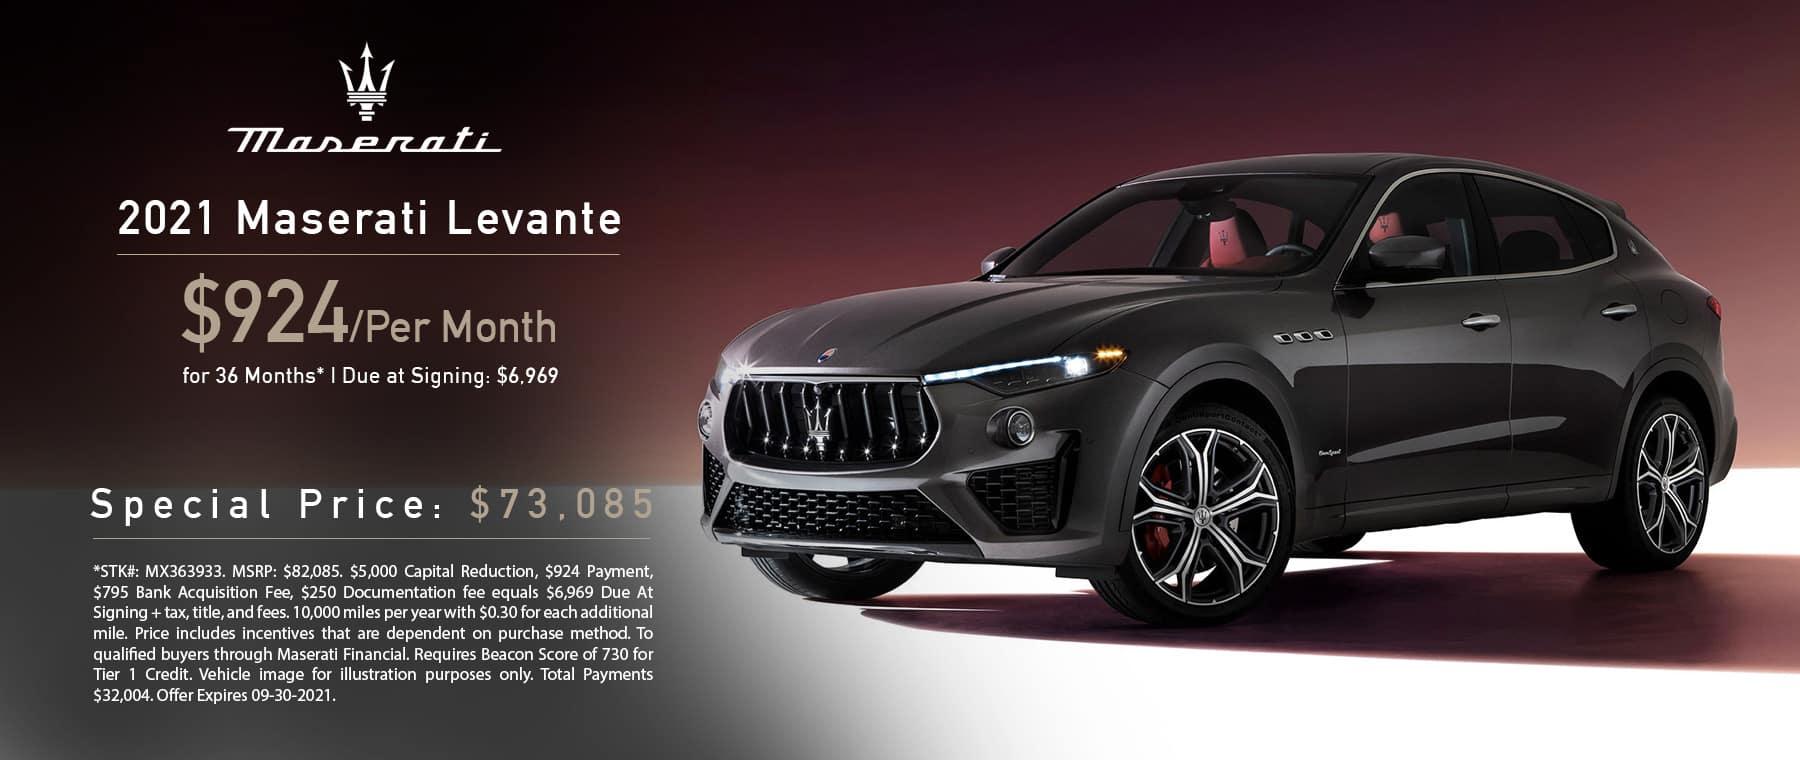 Maserati_2021_Levante_Slide_Sep2021_1